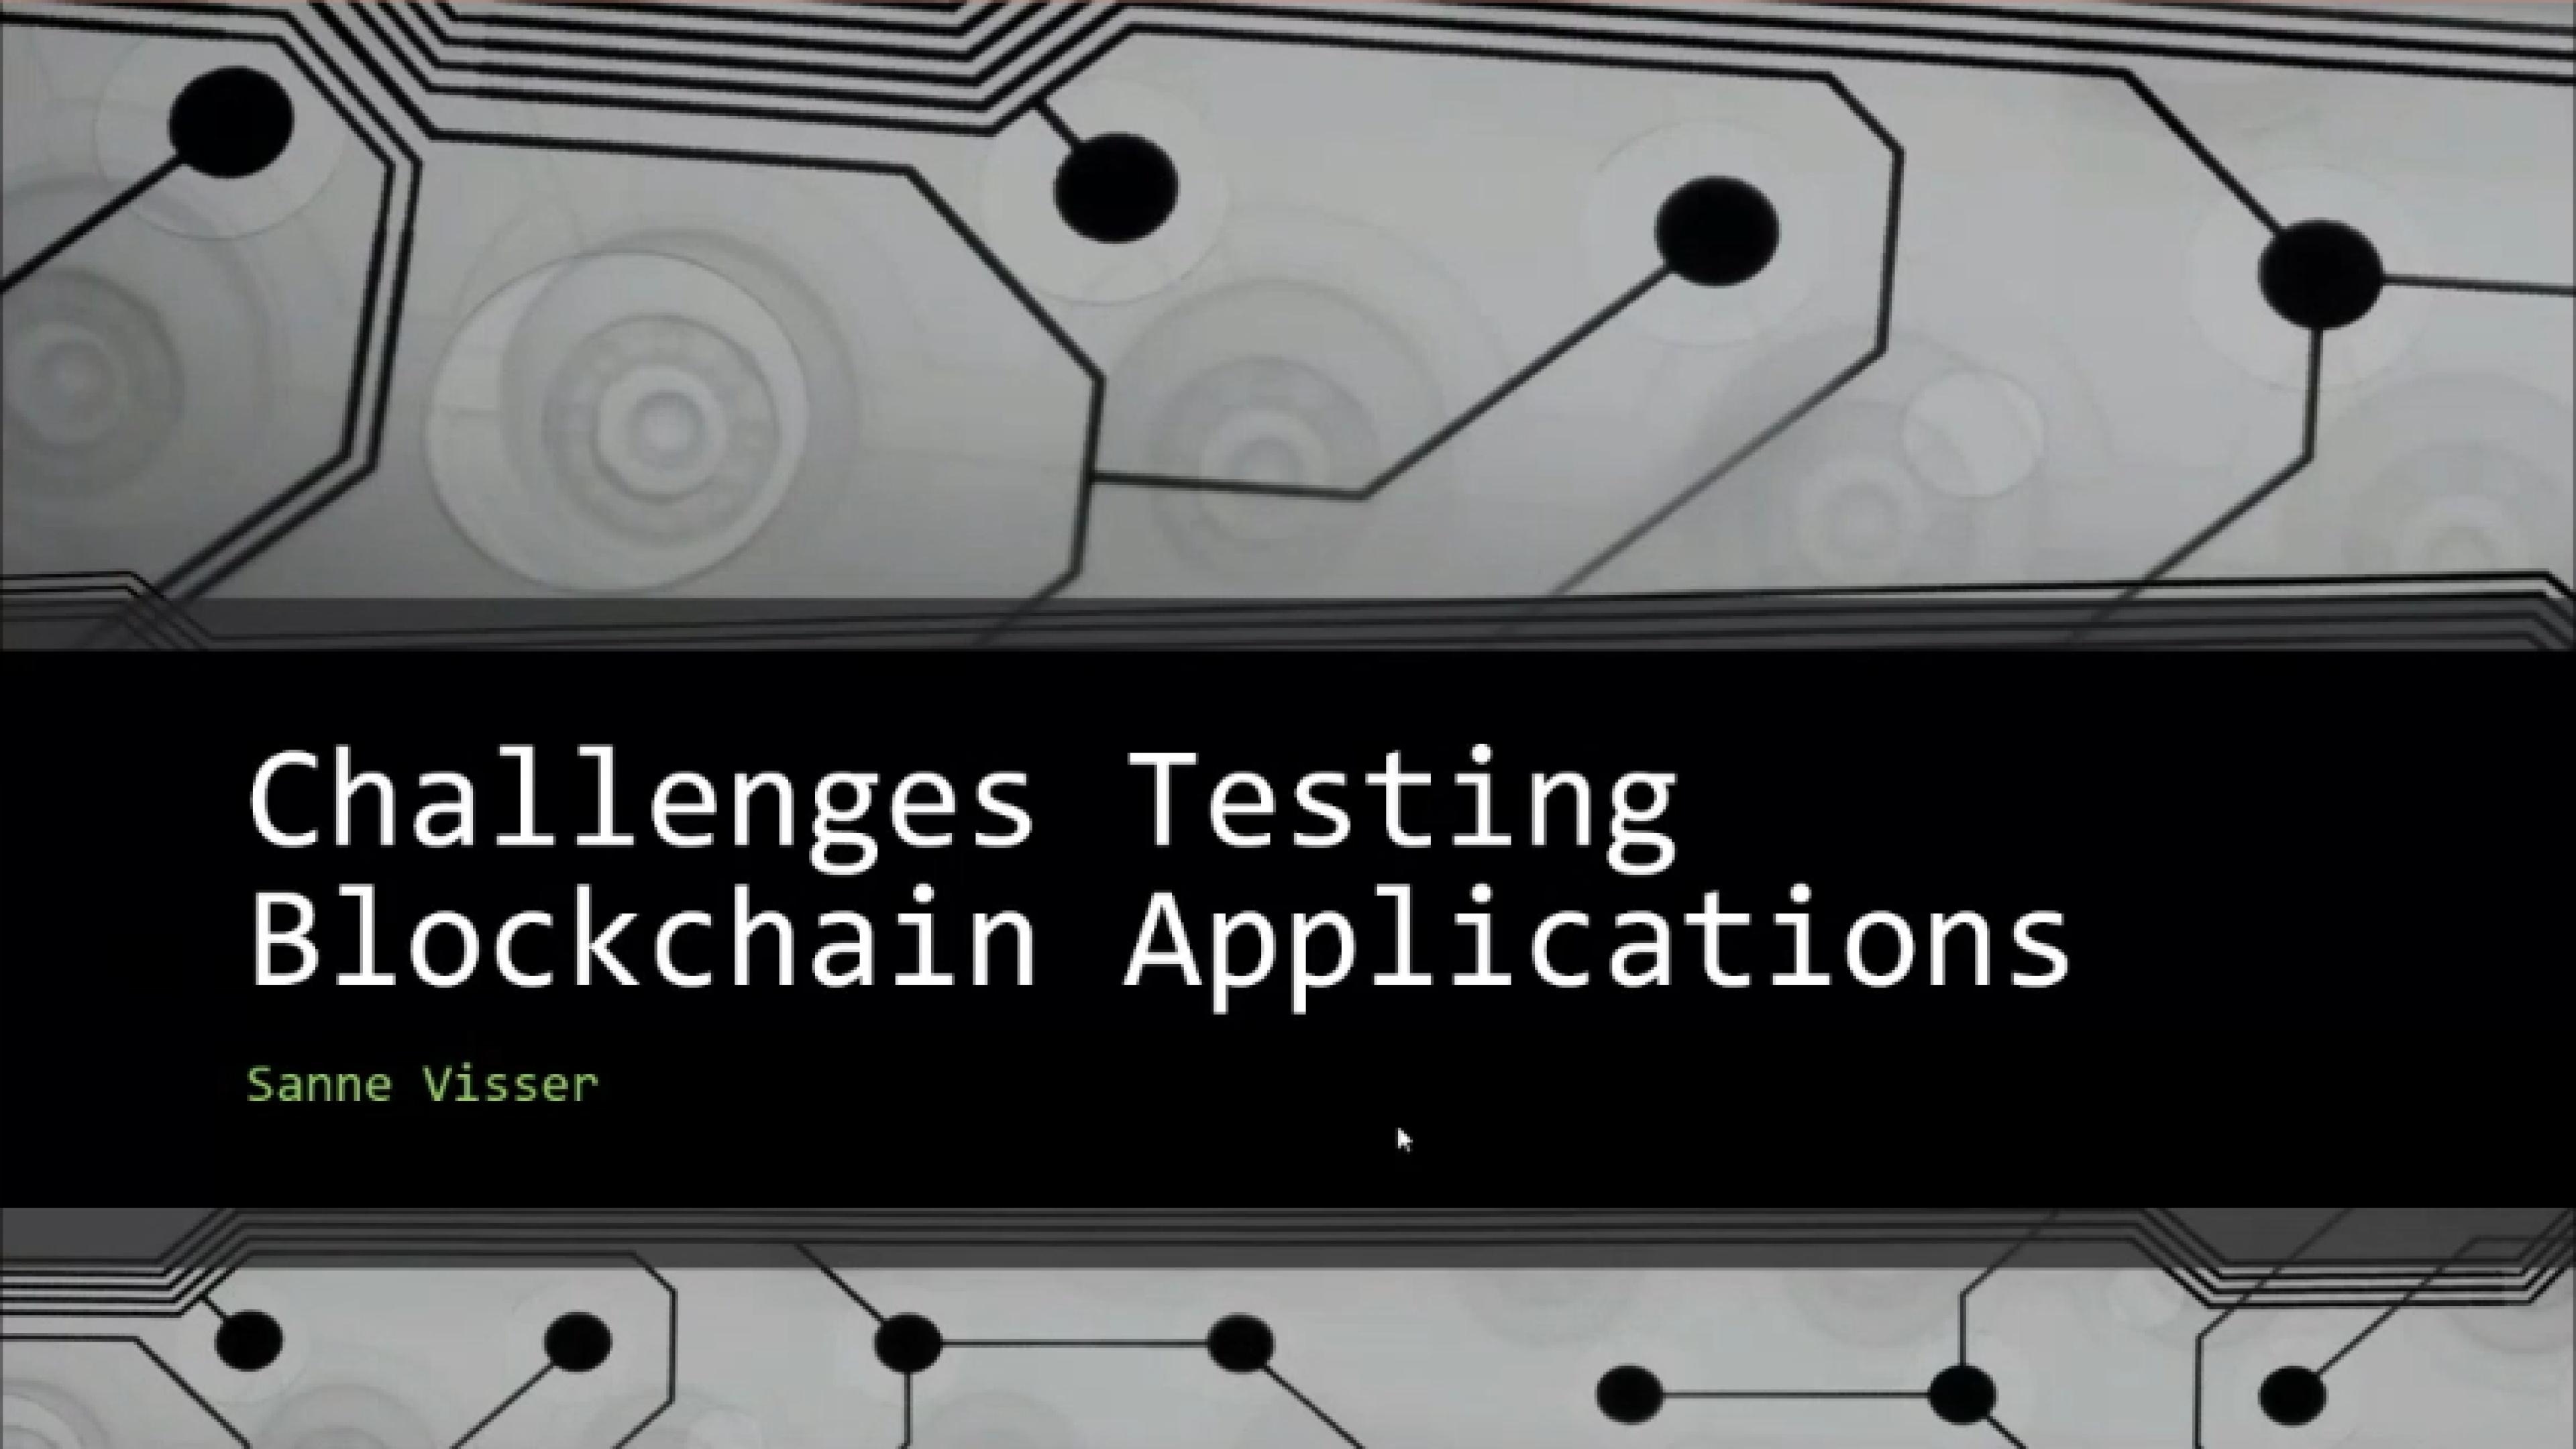 Challenges Testing Blockchain Applications with Sanne Visser